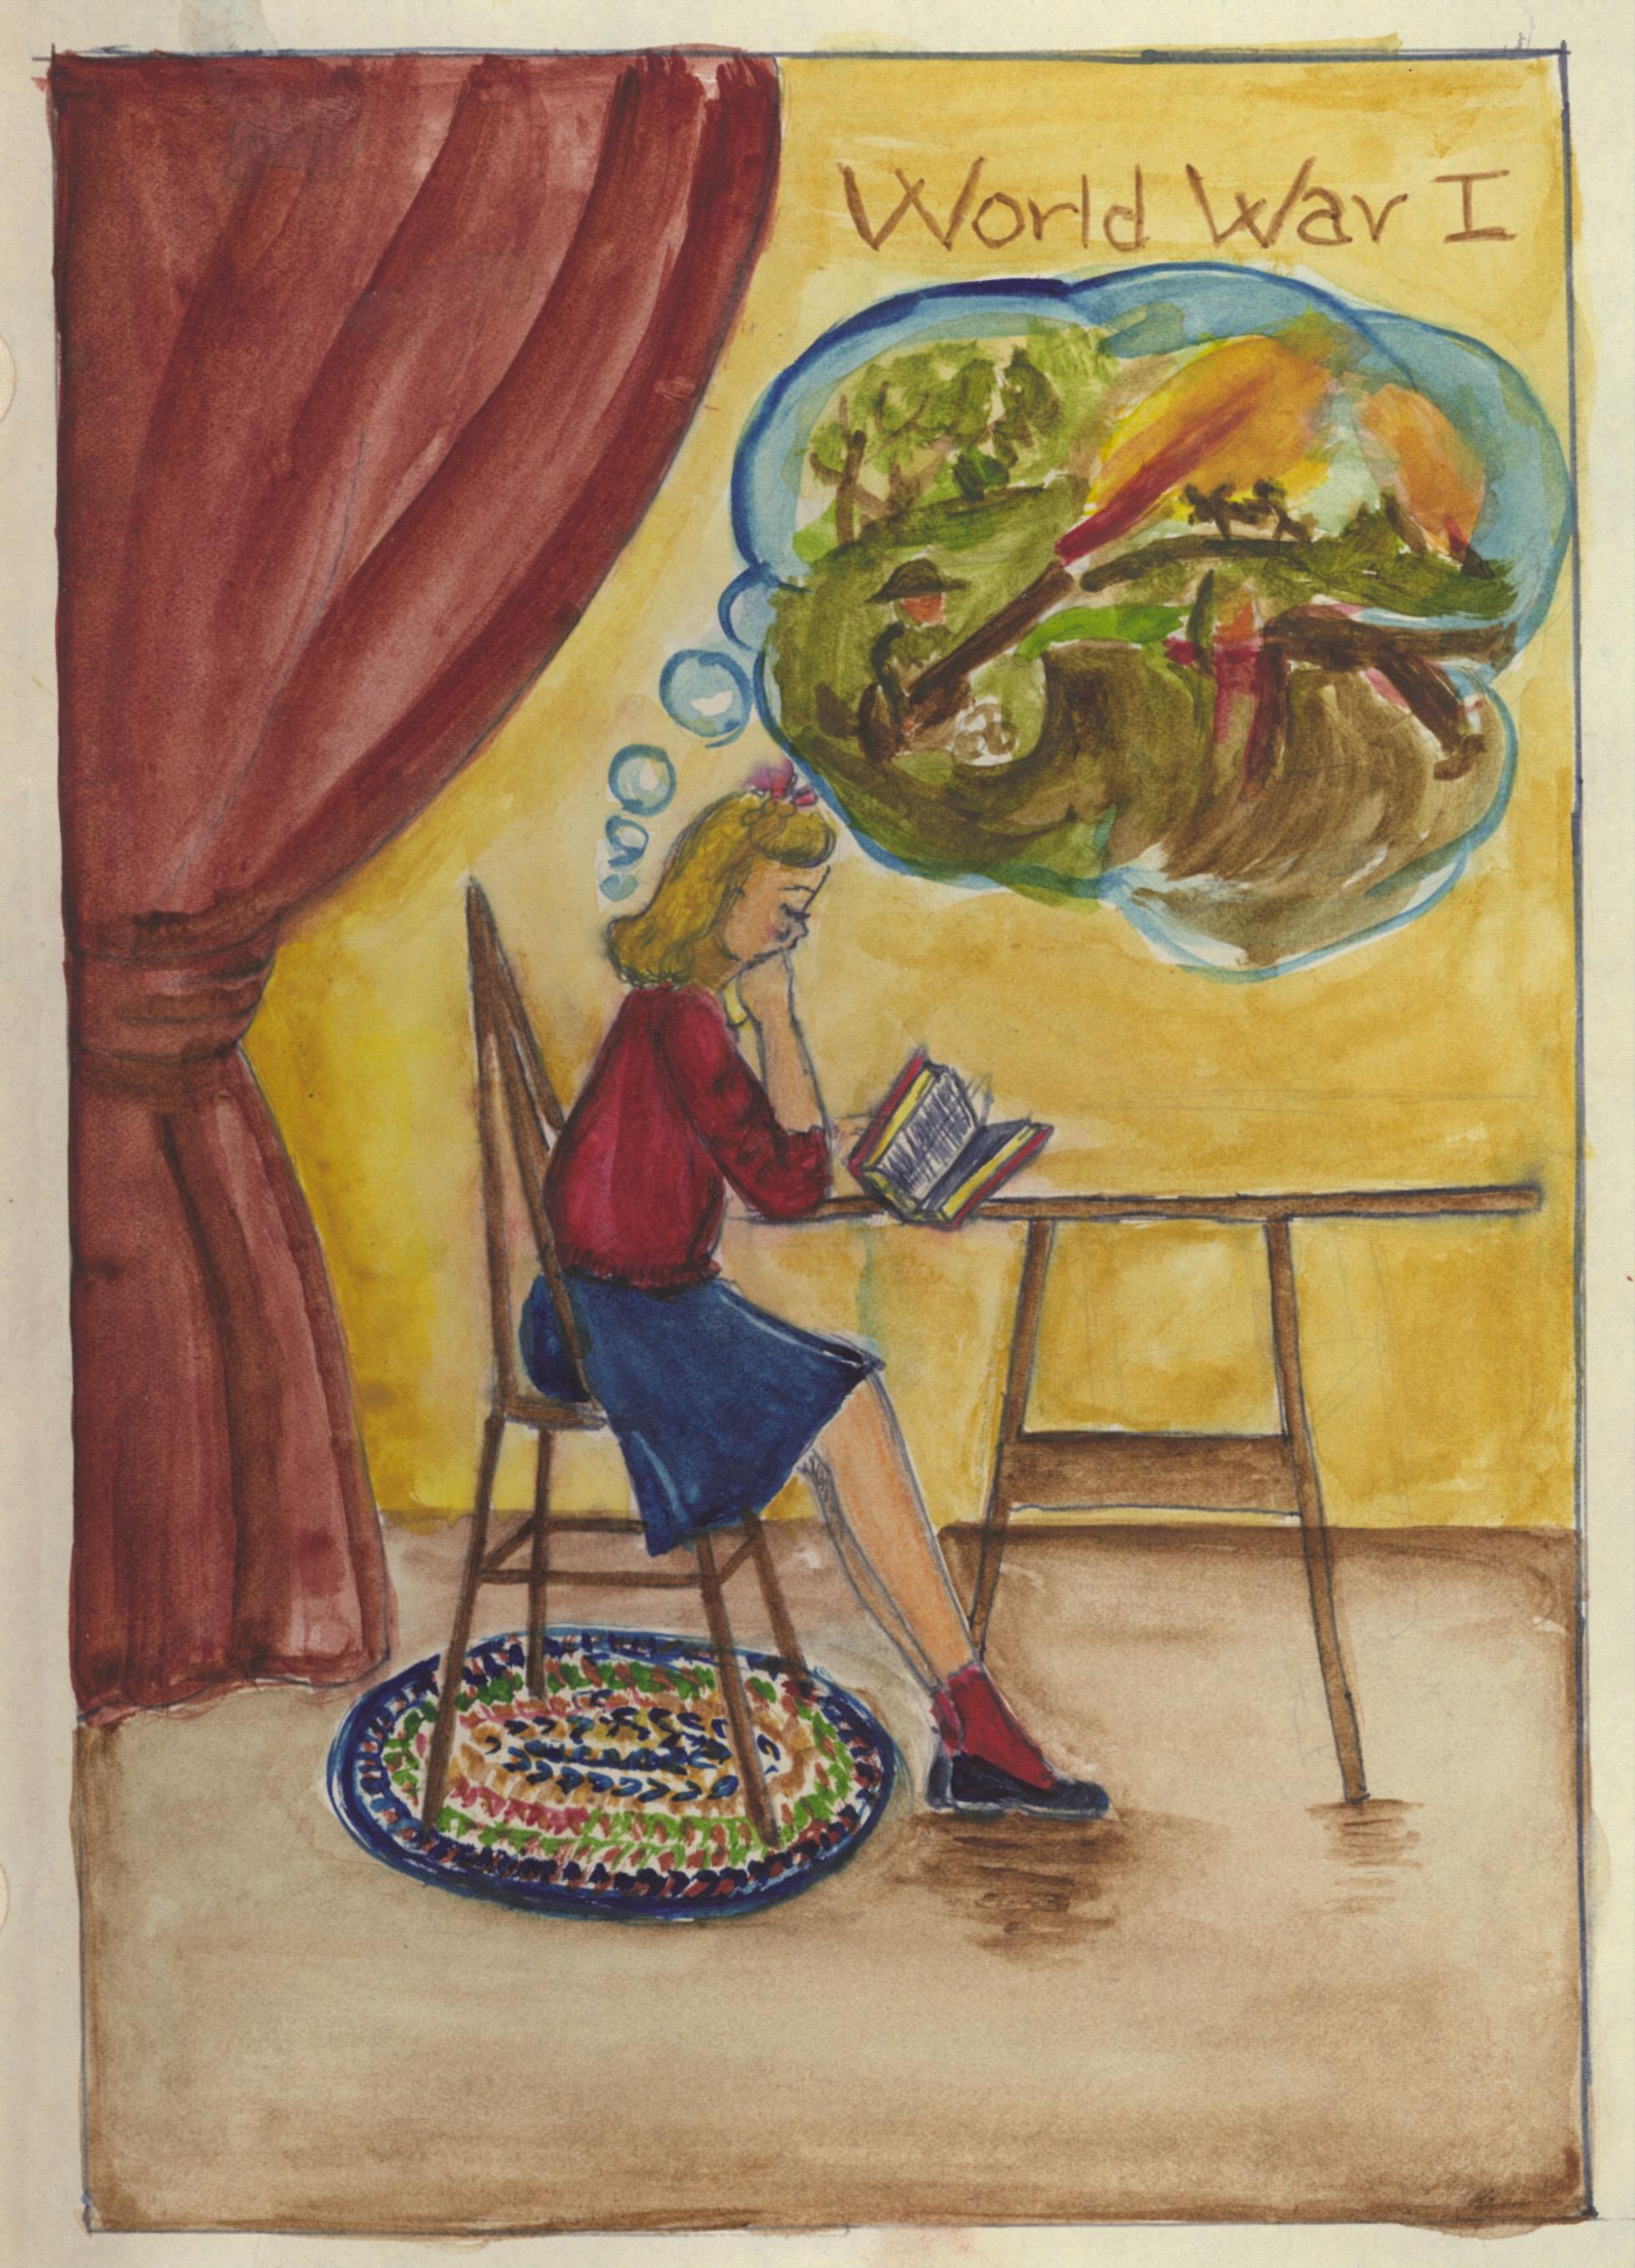 """A War to End Wars"" Self-Portraitby Sylvia Plath. Courtesy Mortimer Rare Book Collection, Smith College, Northampton, Massachusetts, ©Estate of Sylvia Plath"